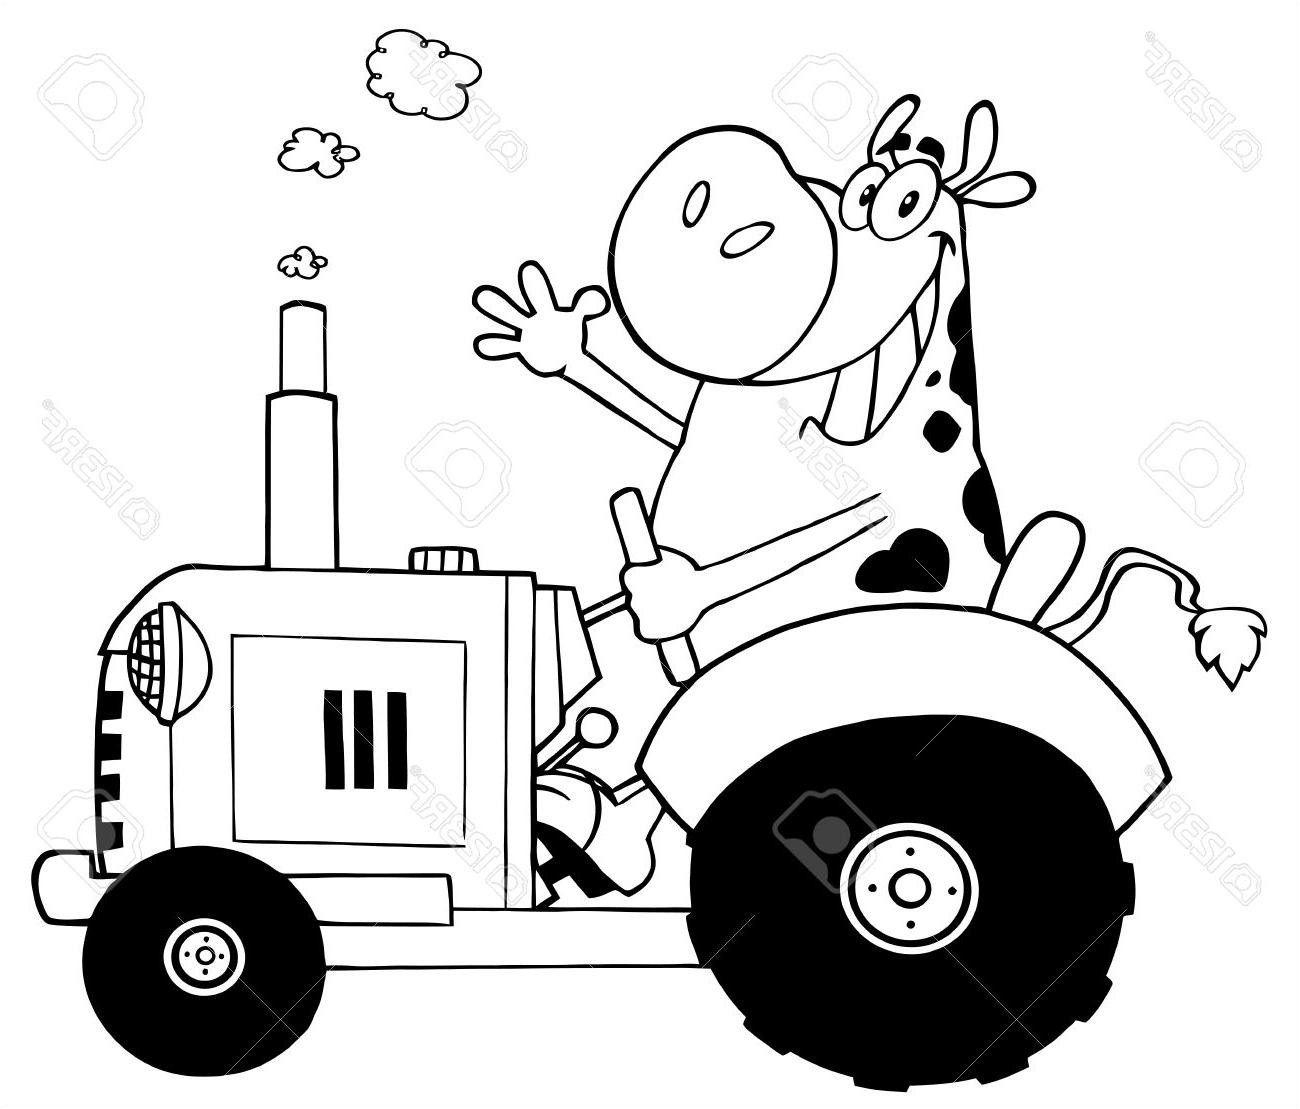 coloriage tracteur new holland facile coloriage tracteur ...